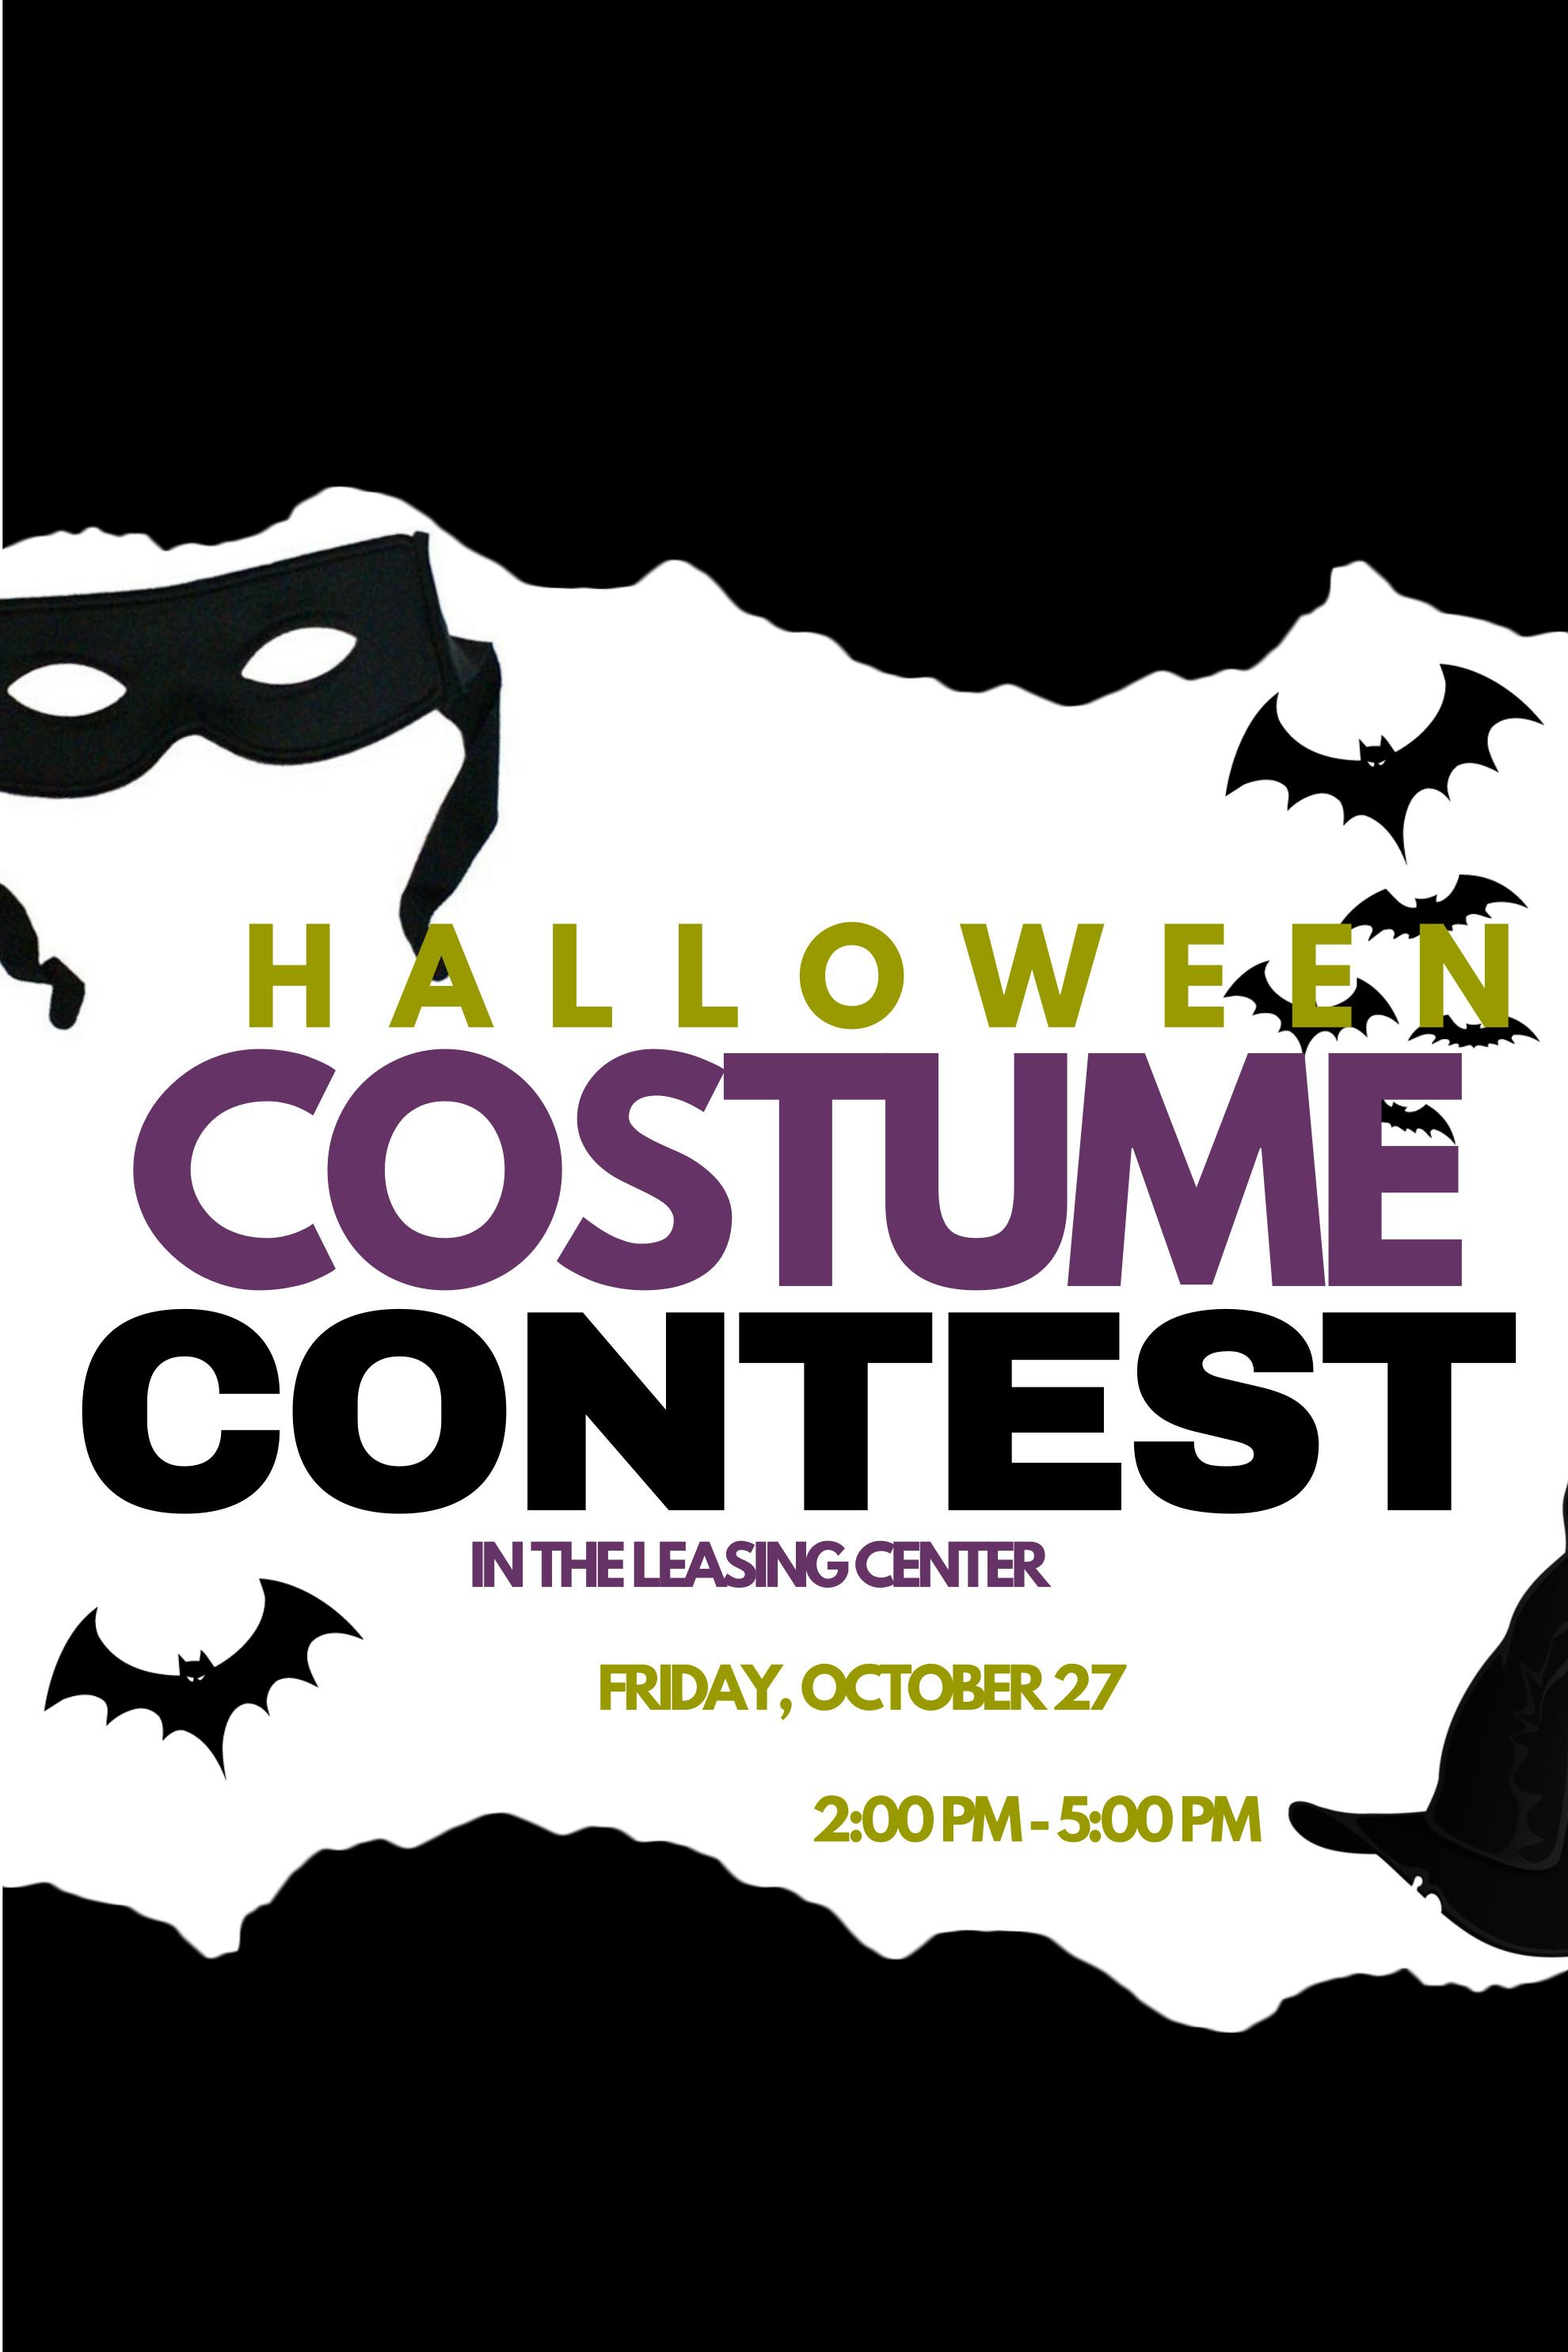 Satyr Hill Costume Contest.jpg